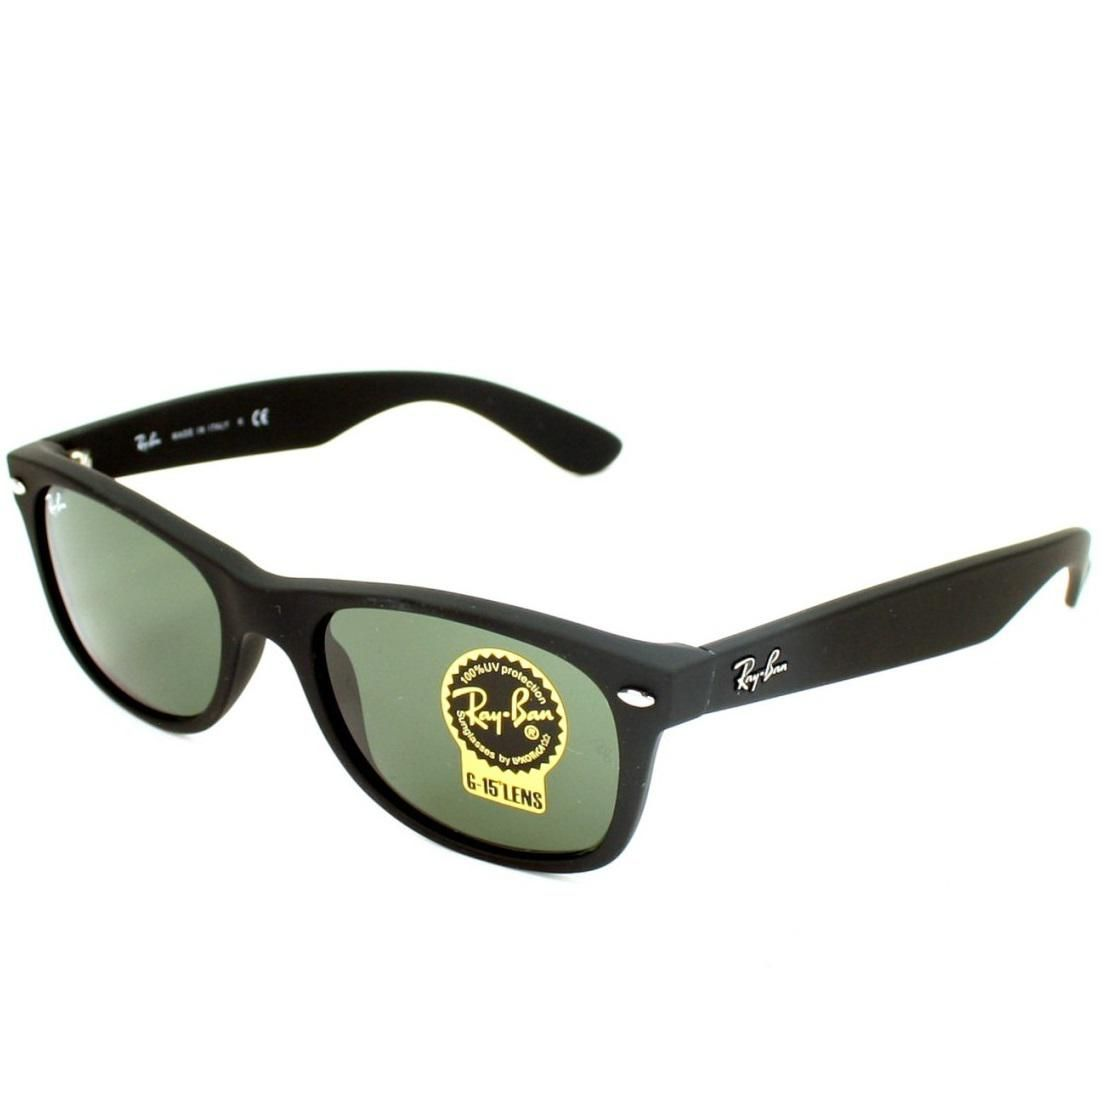 Ray-Ban RB2132 New Wayfarer Matte 622 Sunglasses Black